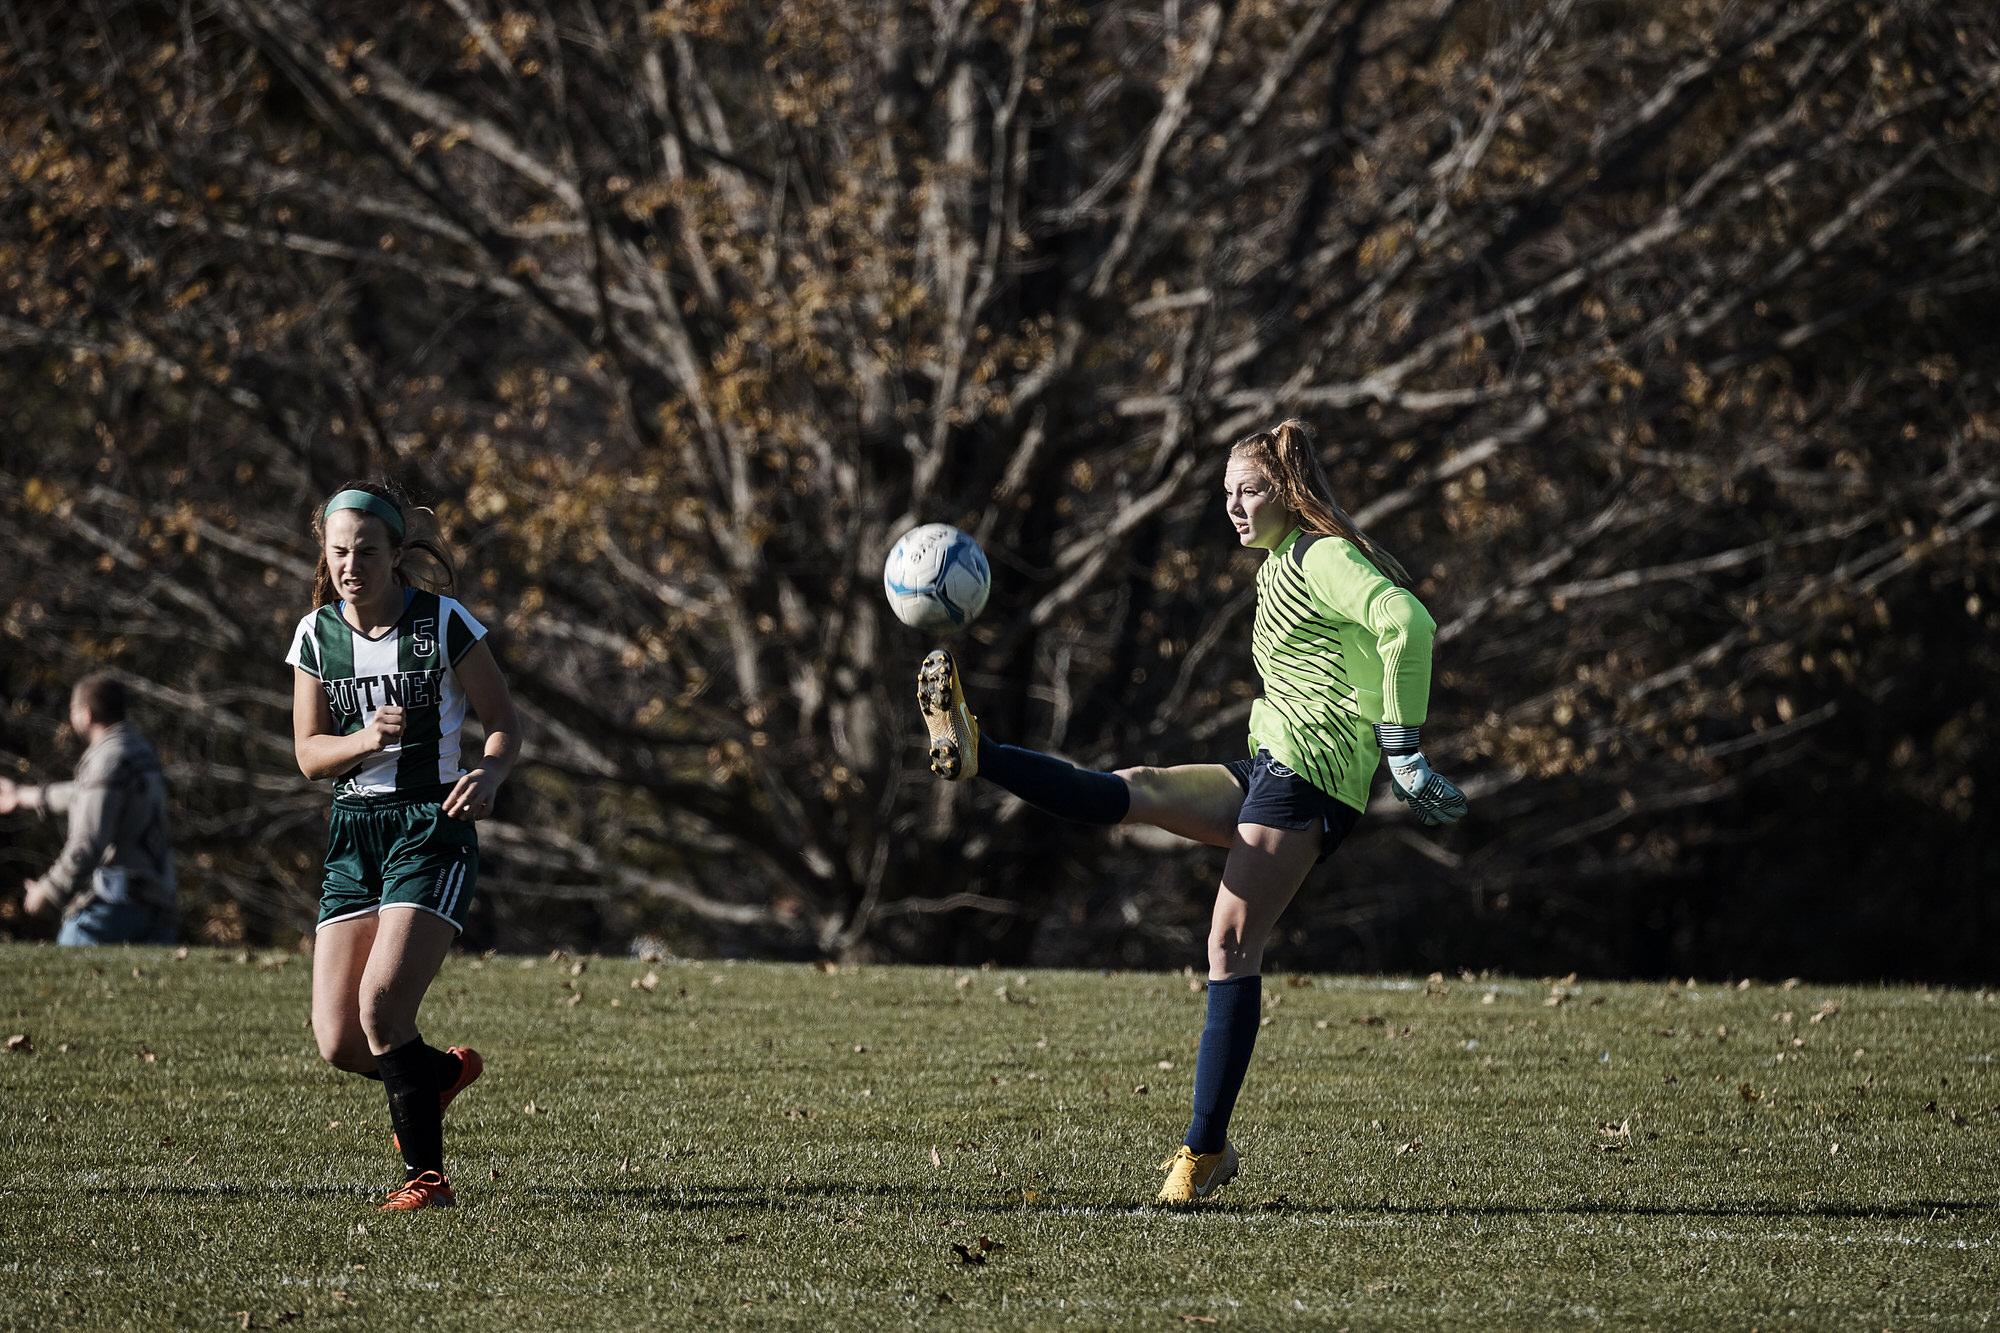 Girls Varsity Soccer vs. Putney School - October 26, 2018 - 004.jpg